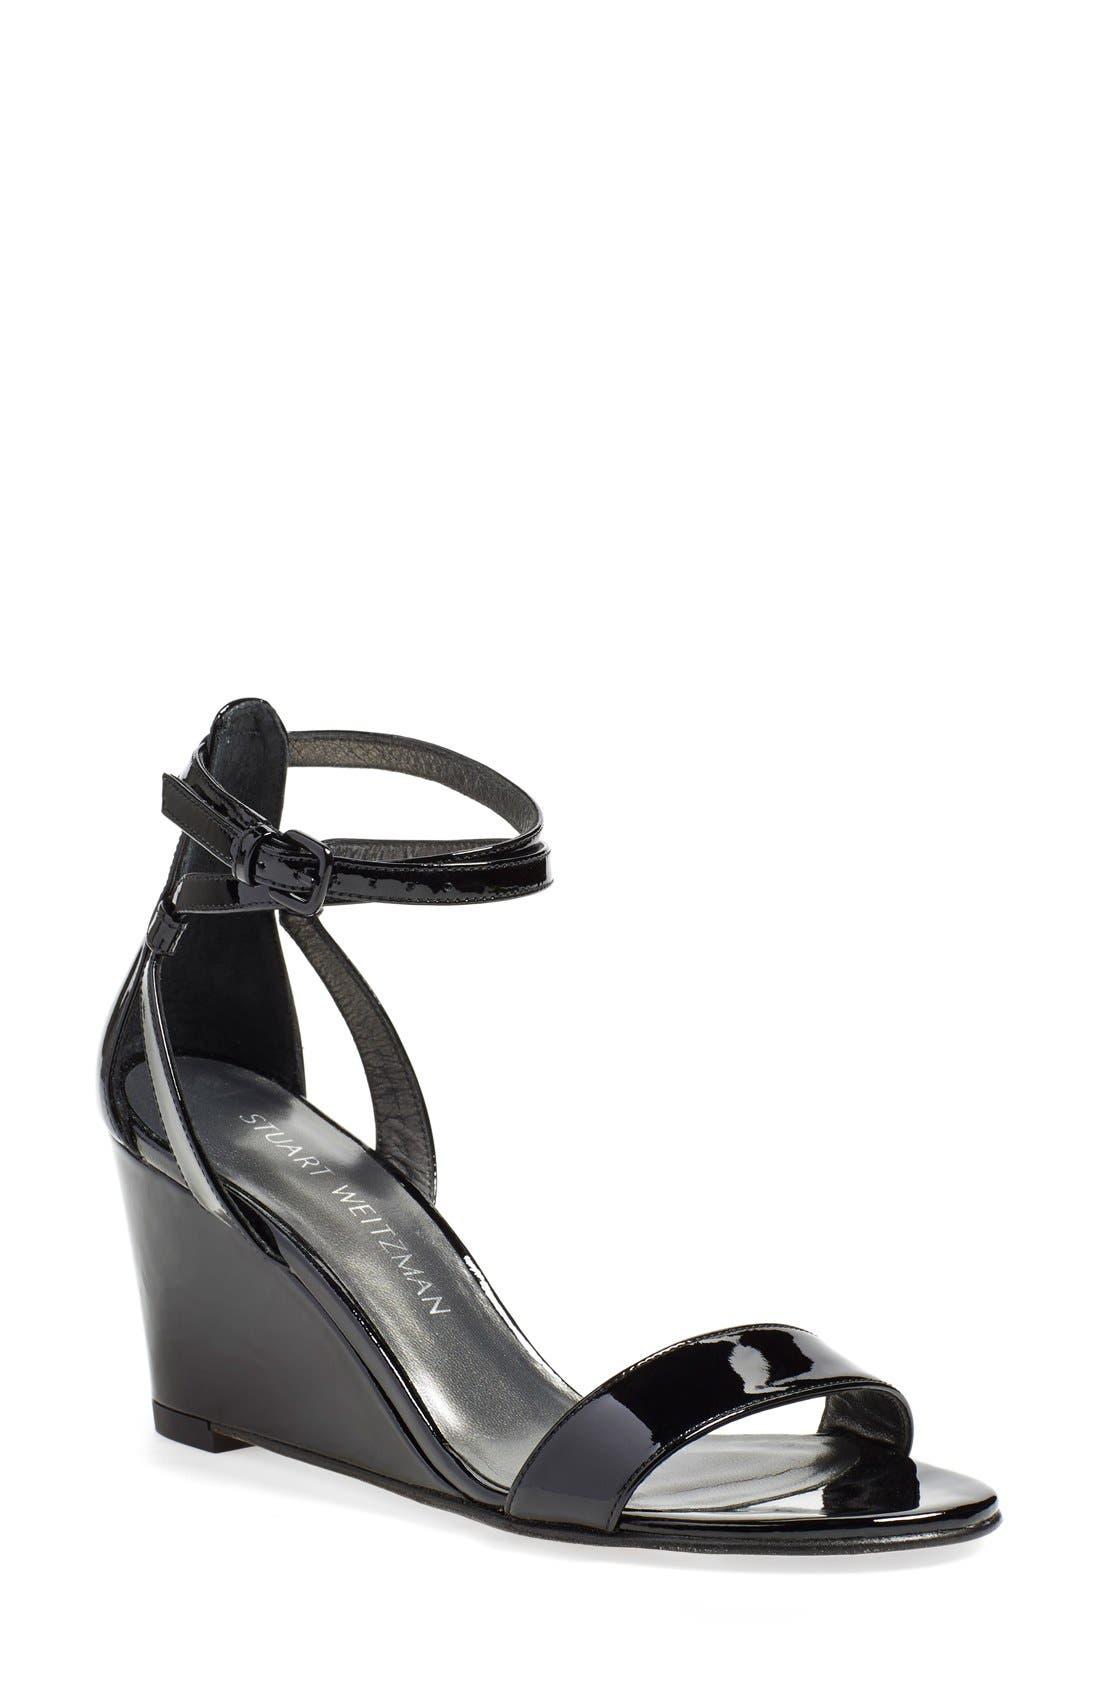 'Backdraft' Ankle Strap Wedge Sandal,                             Main thumbnail 1, color,                             002